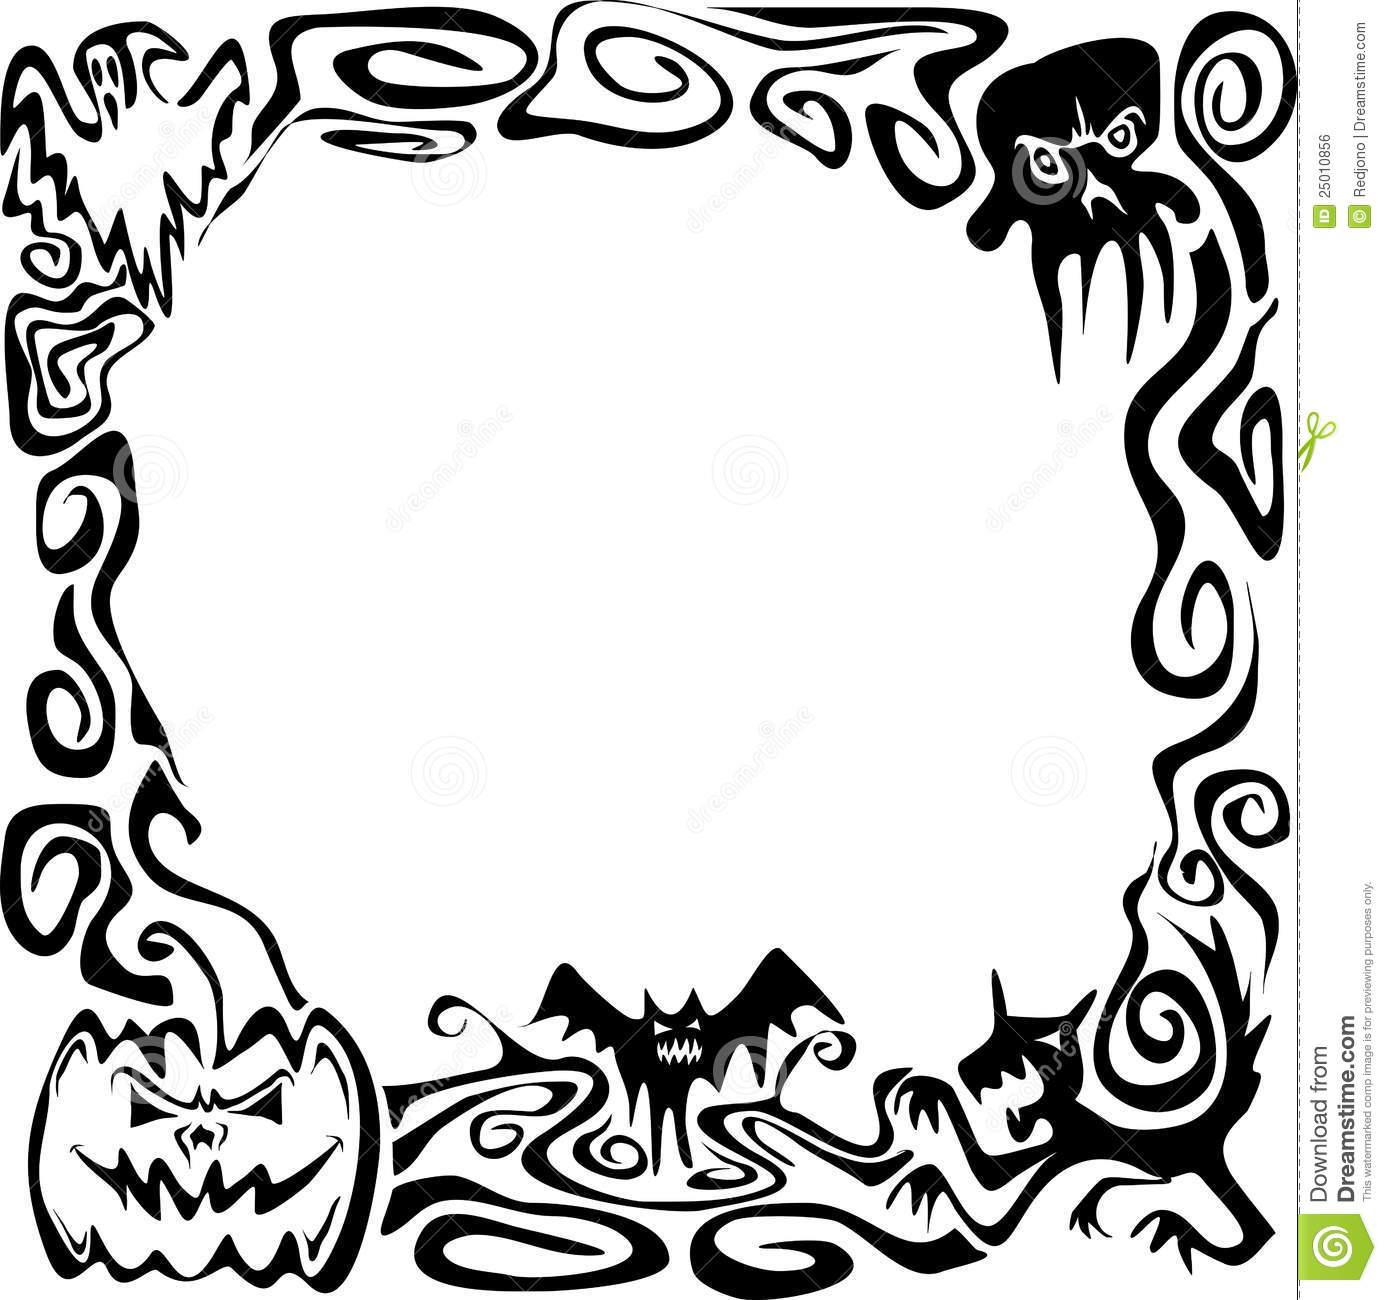 1387x1300 Clipart Border Black And White